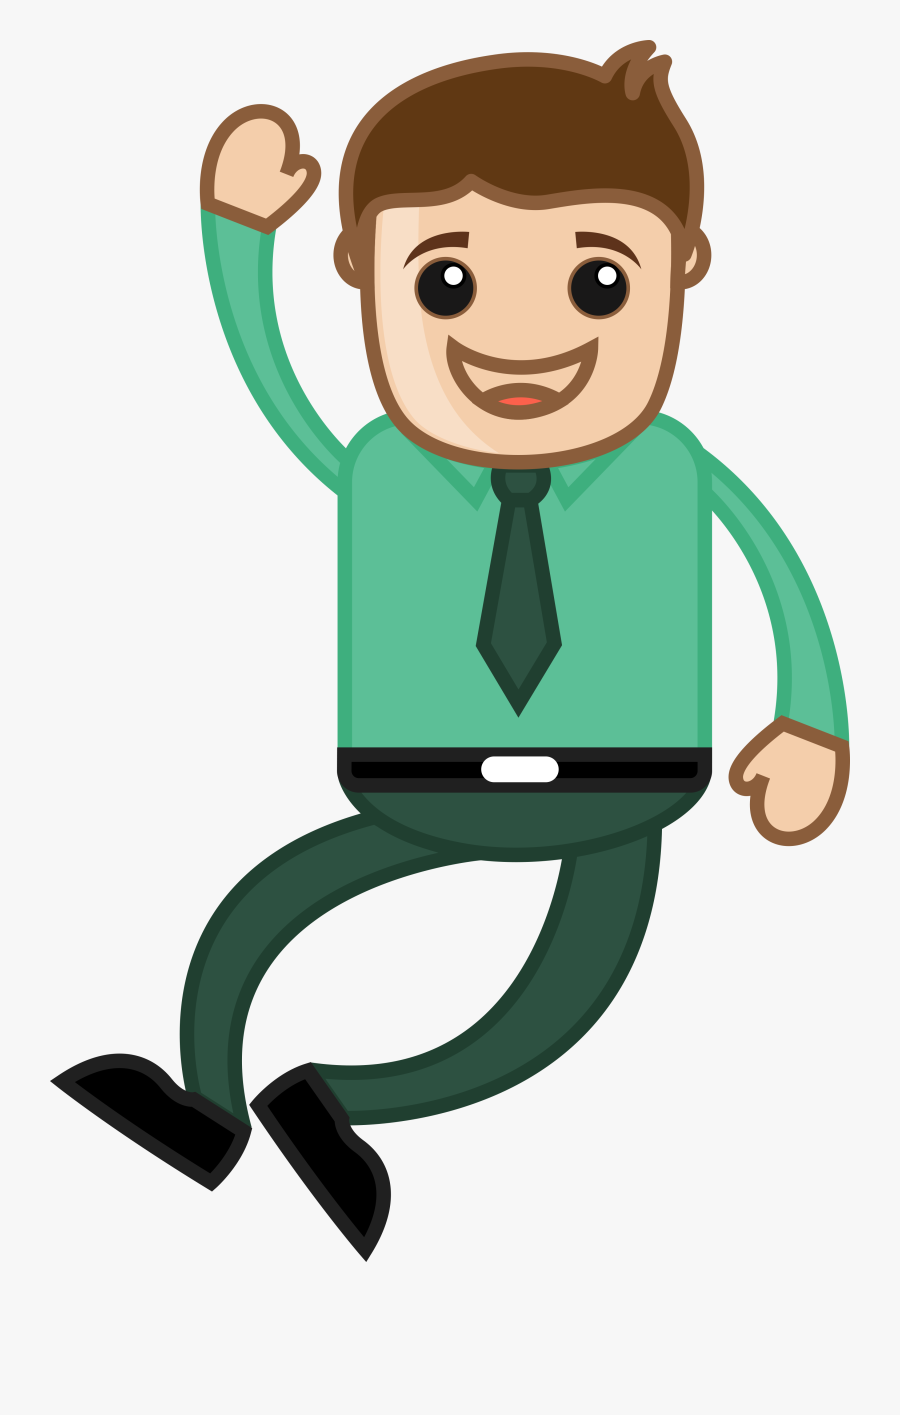 Cartoon Sadness Royalty Free Clip Art Royaltyfree - Happy Man Cartoon, Transparent Clipart